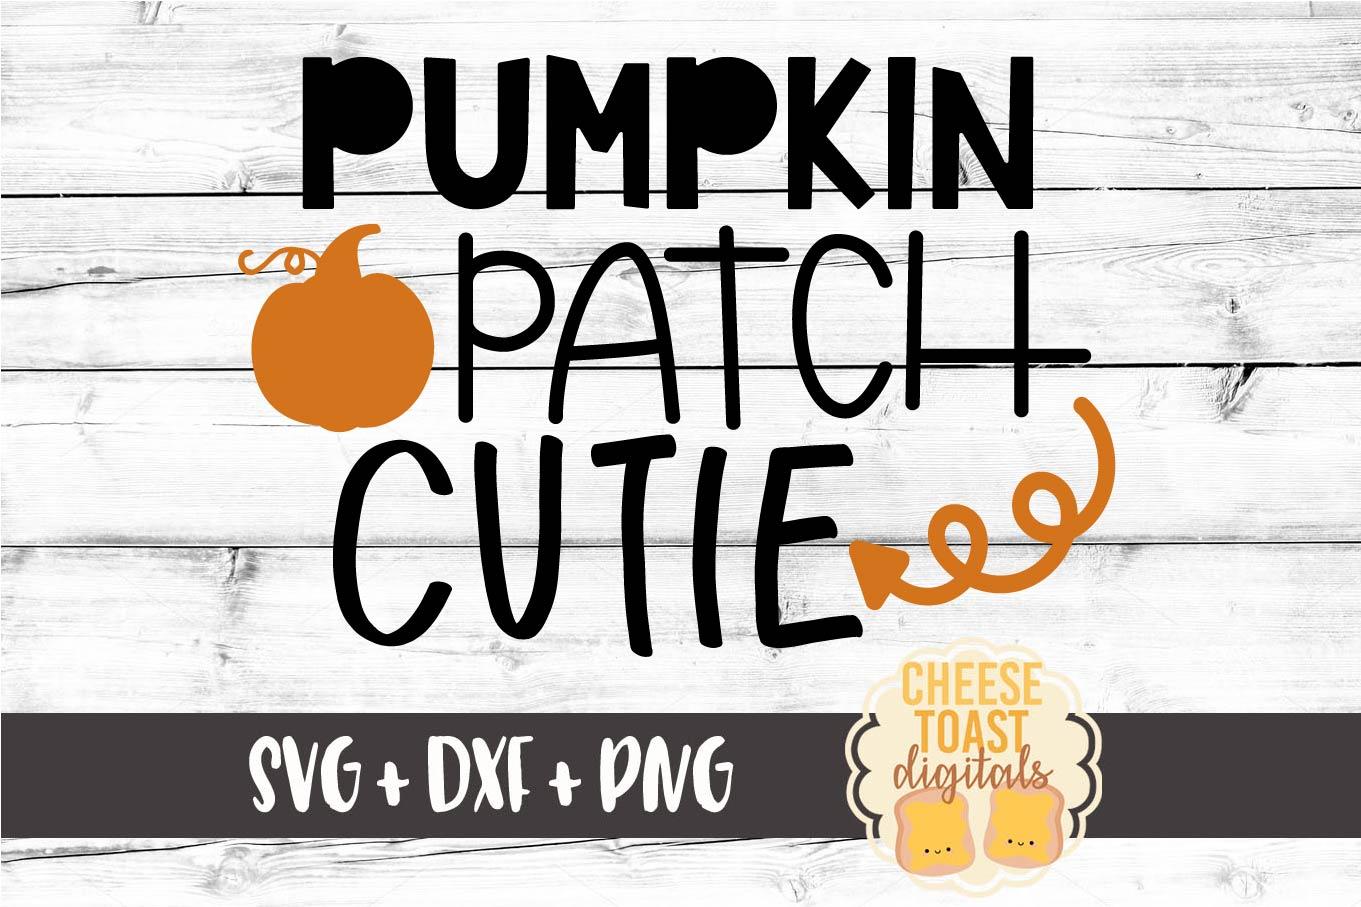 Pumpkin Patch Cutie - Fall SVG File example image 2